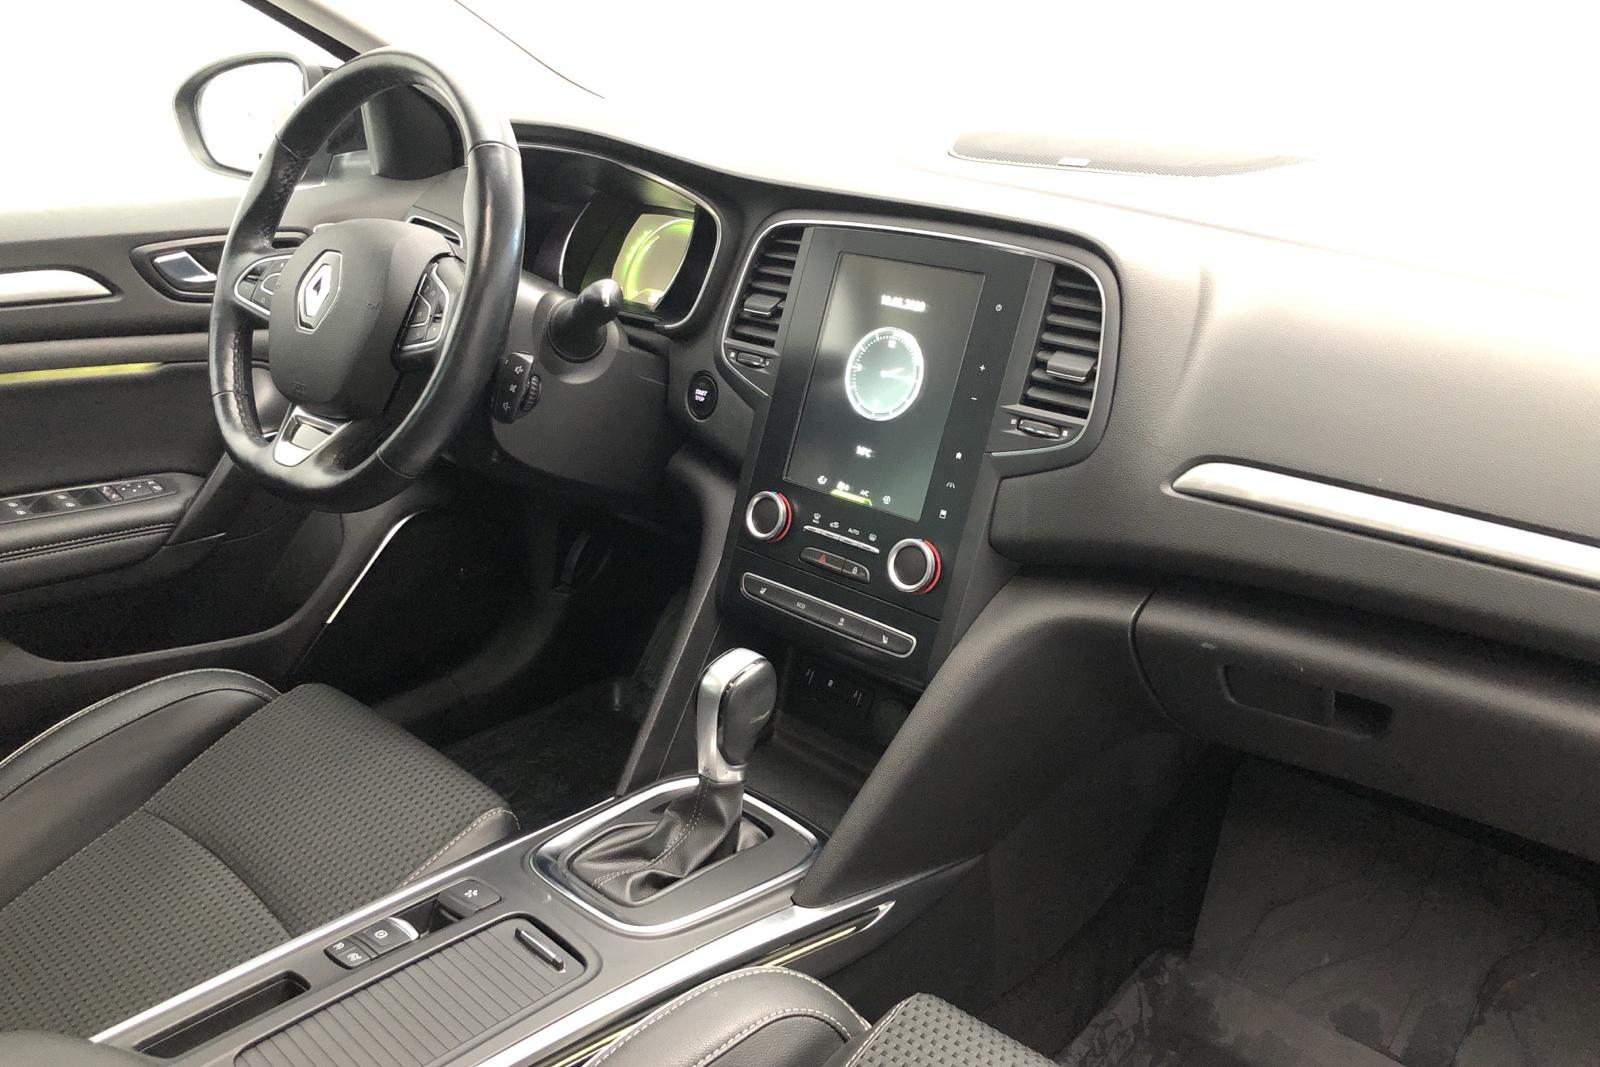 Renault Mégane 1.5 dCi 5dr (110hk) - 0 km - black - 2017